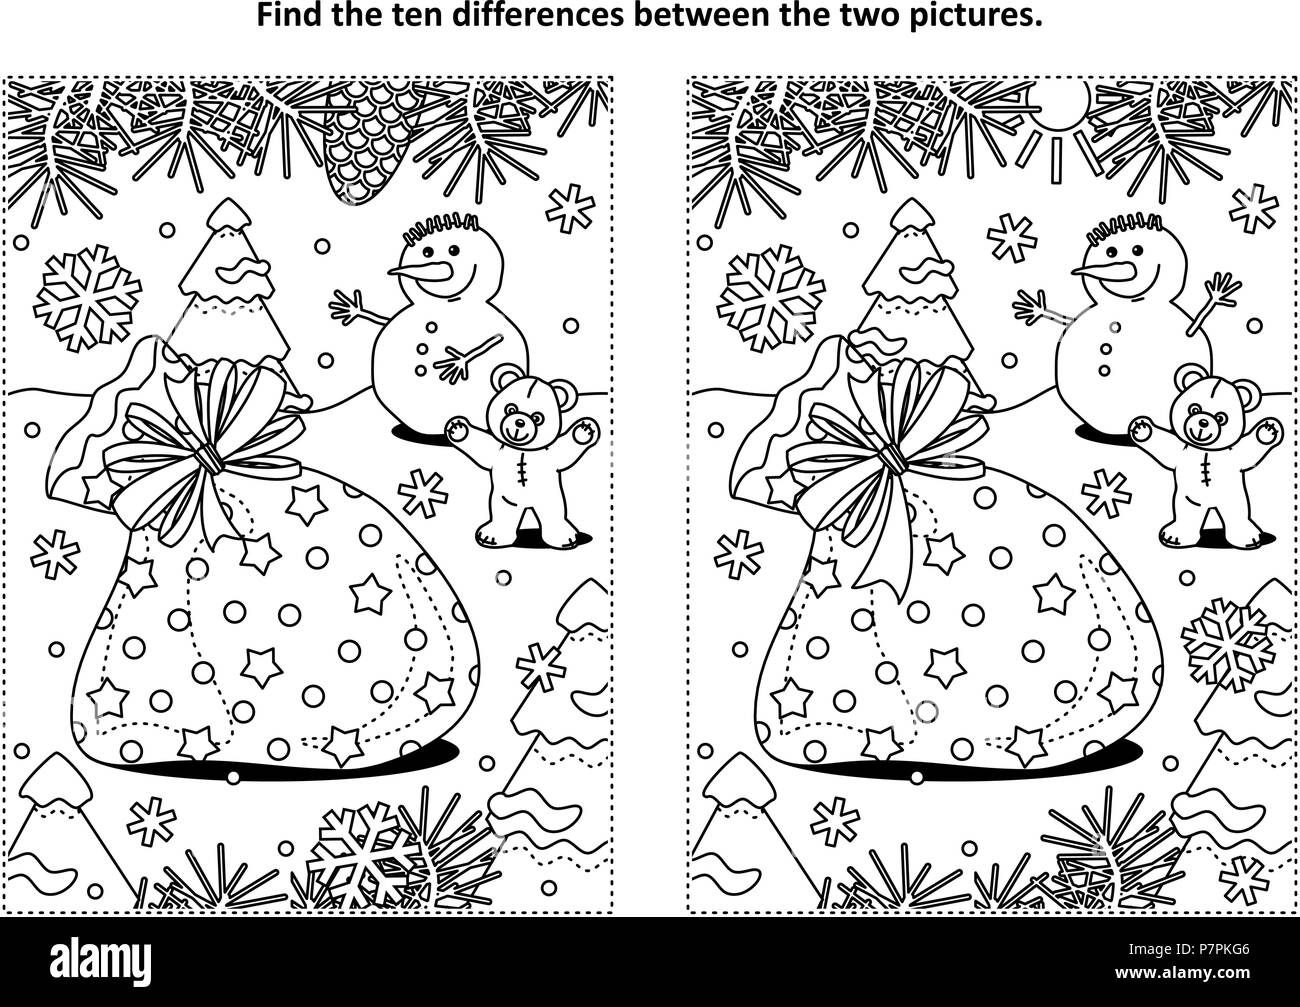 Christmas Differences Game Kids Stockfotos & Christmas Differences ...